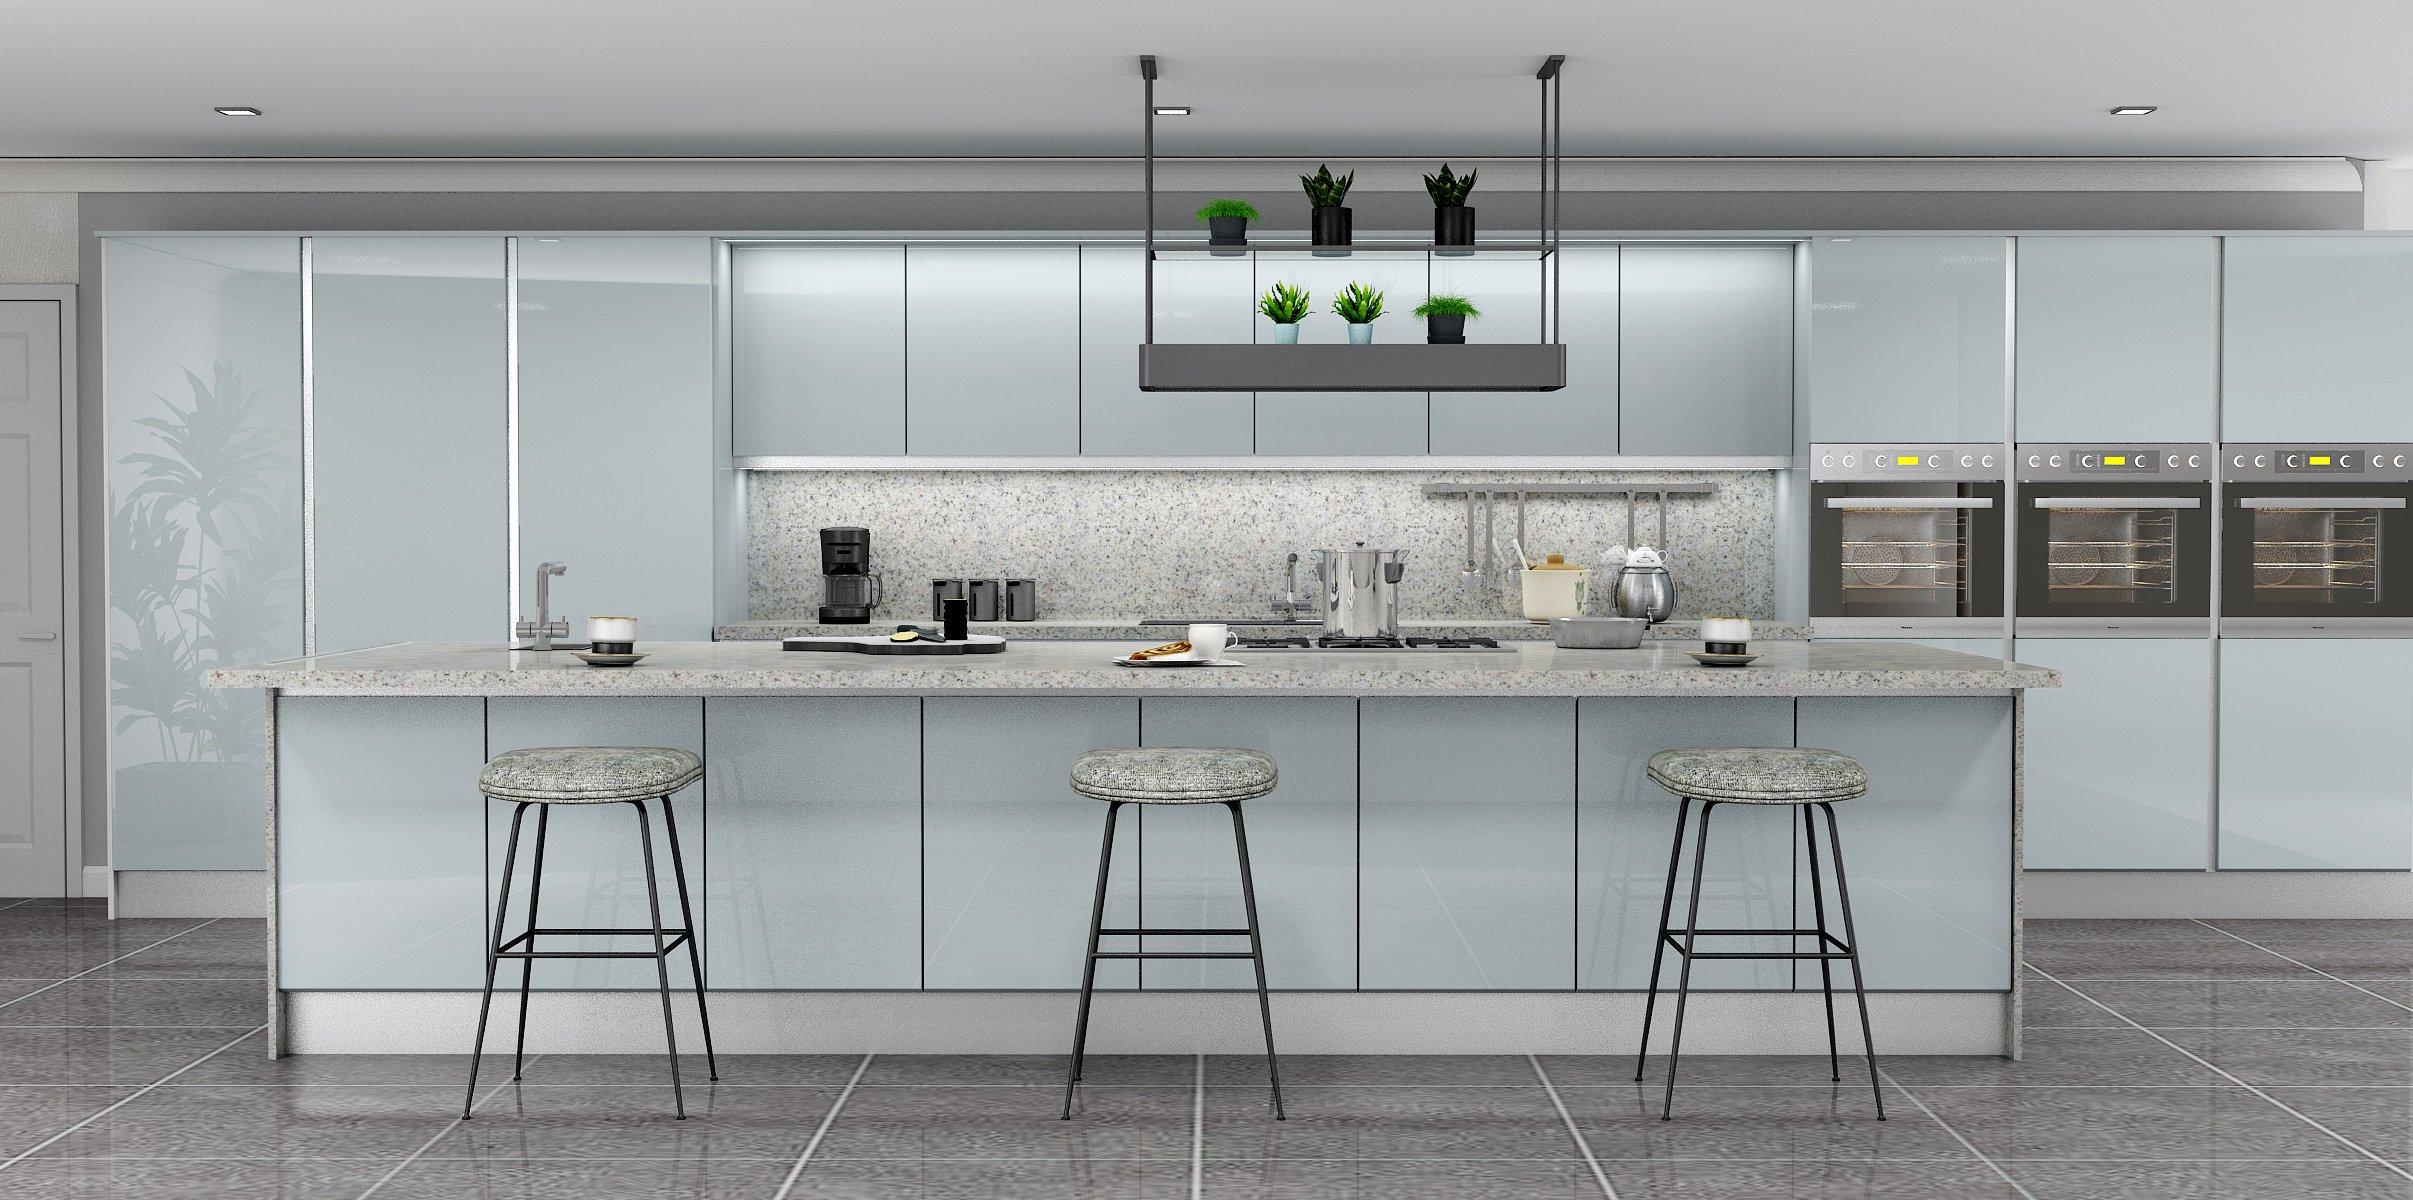 Handlless Kitchen in Light grey gloss finish LED Lights